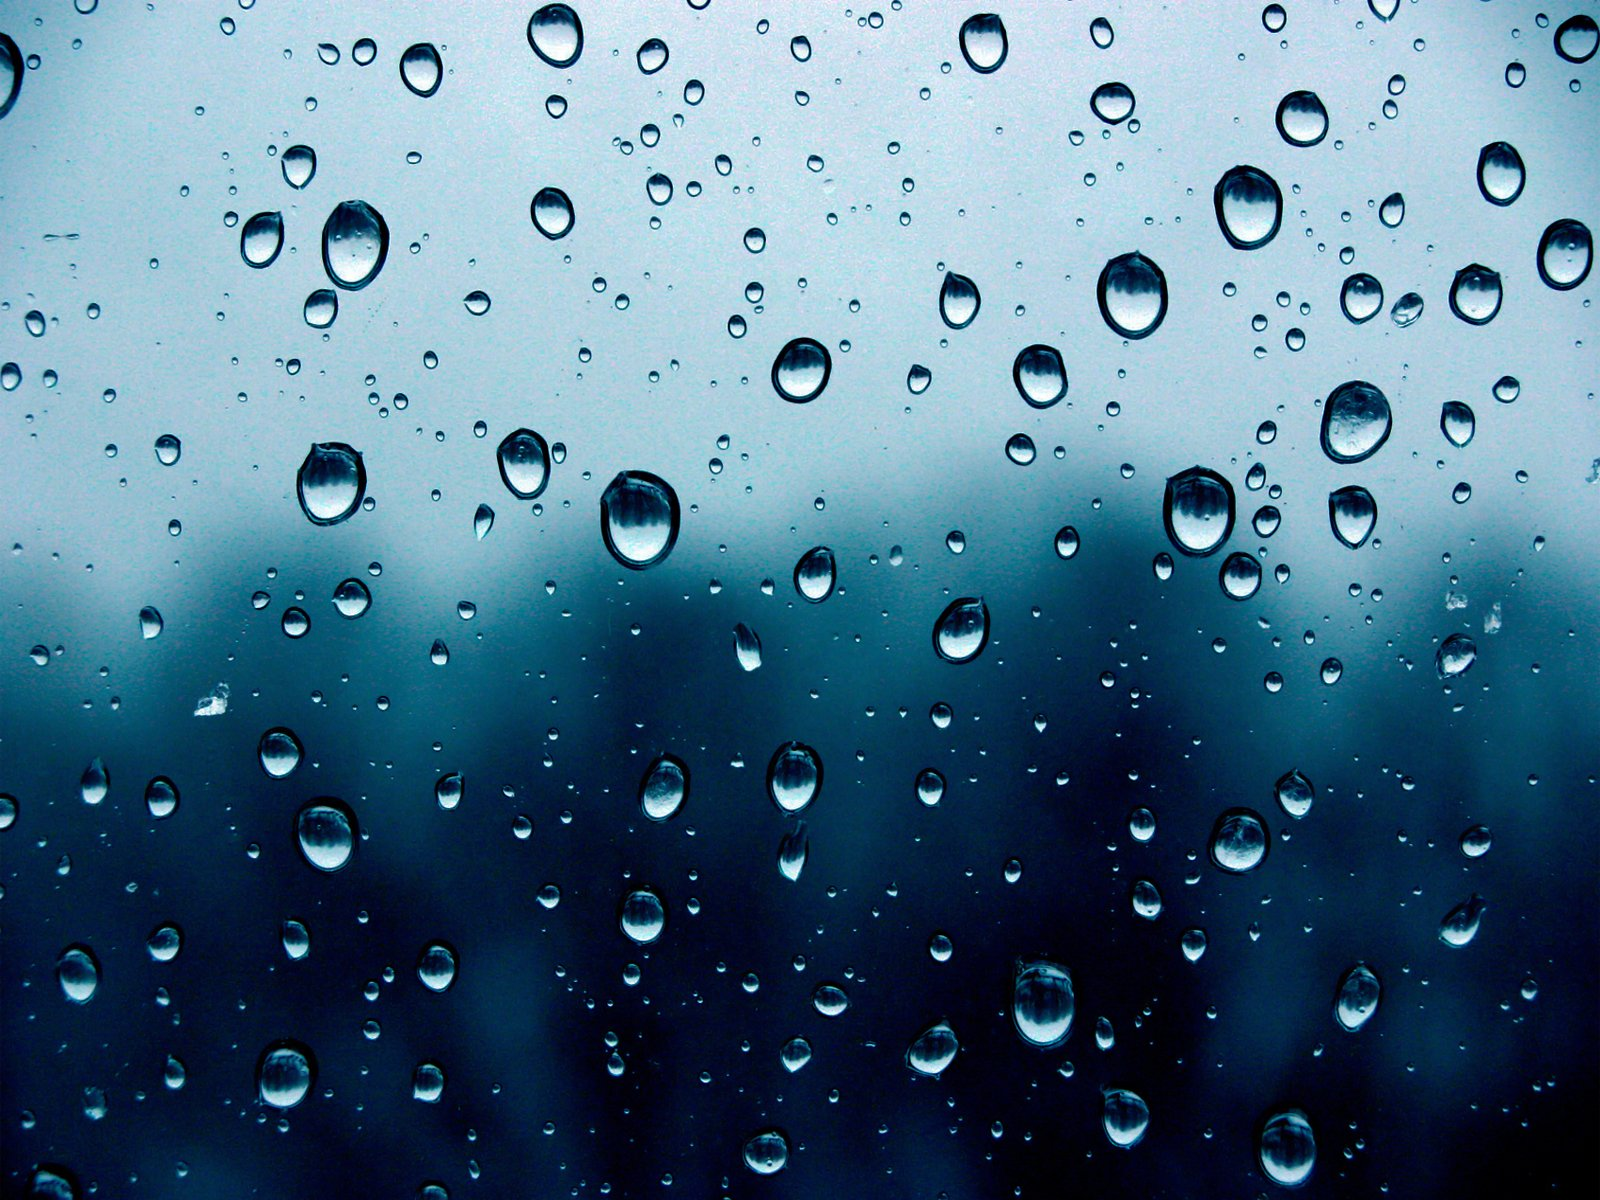 Water Drops Wallpapers 01